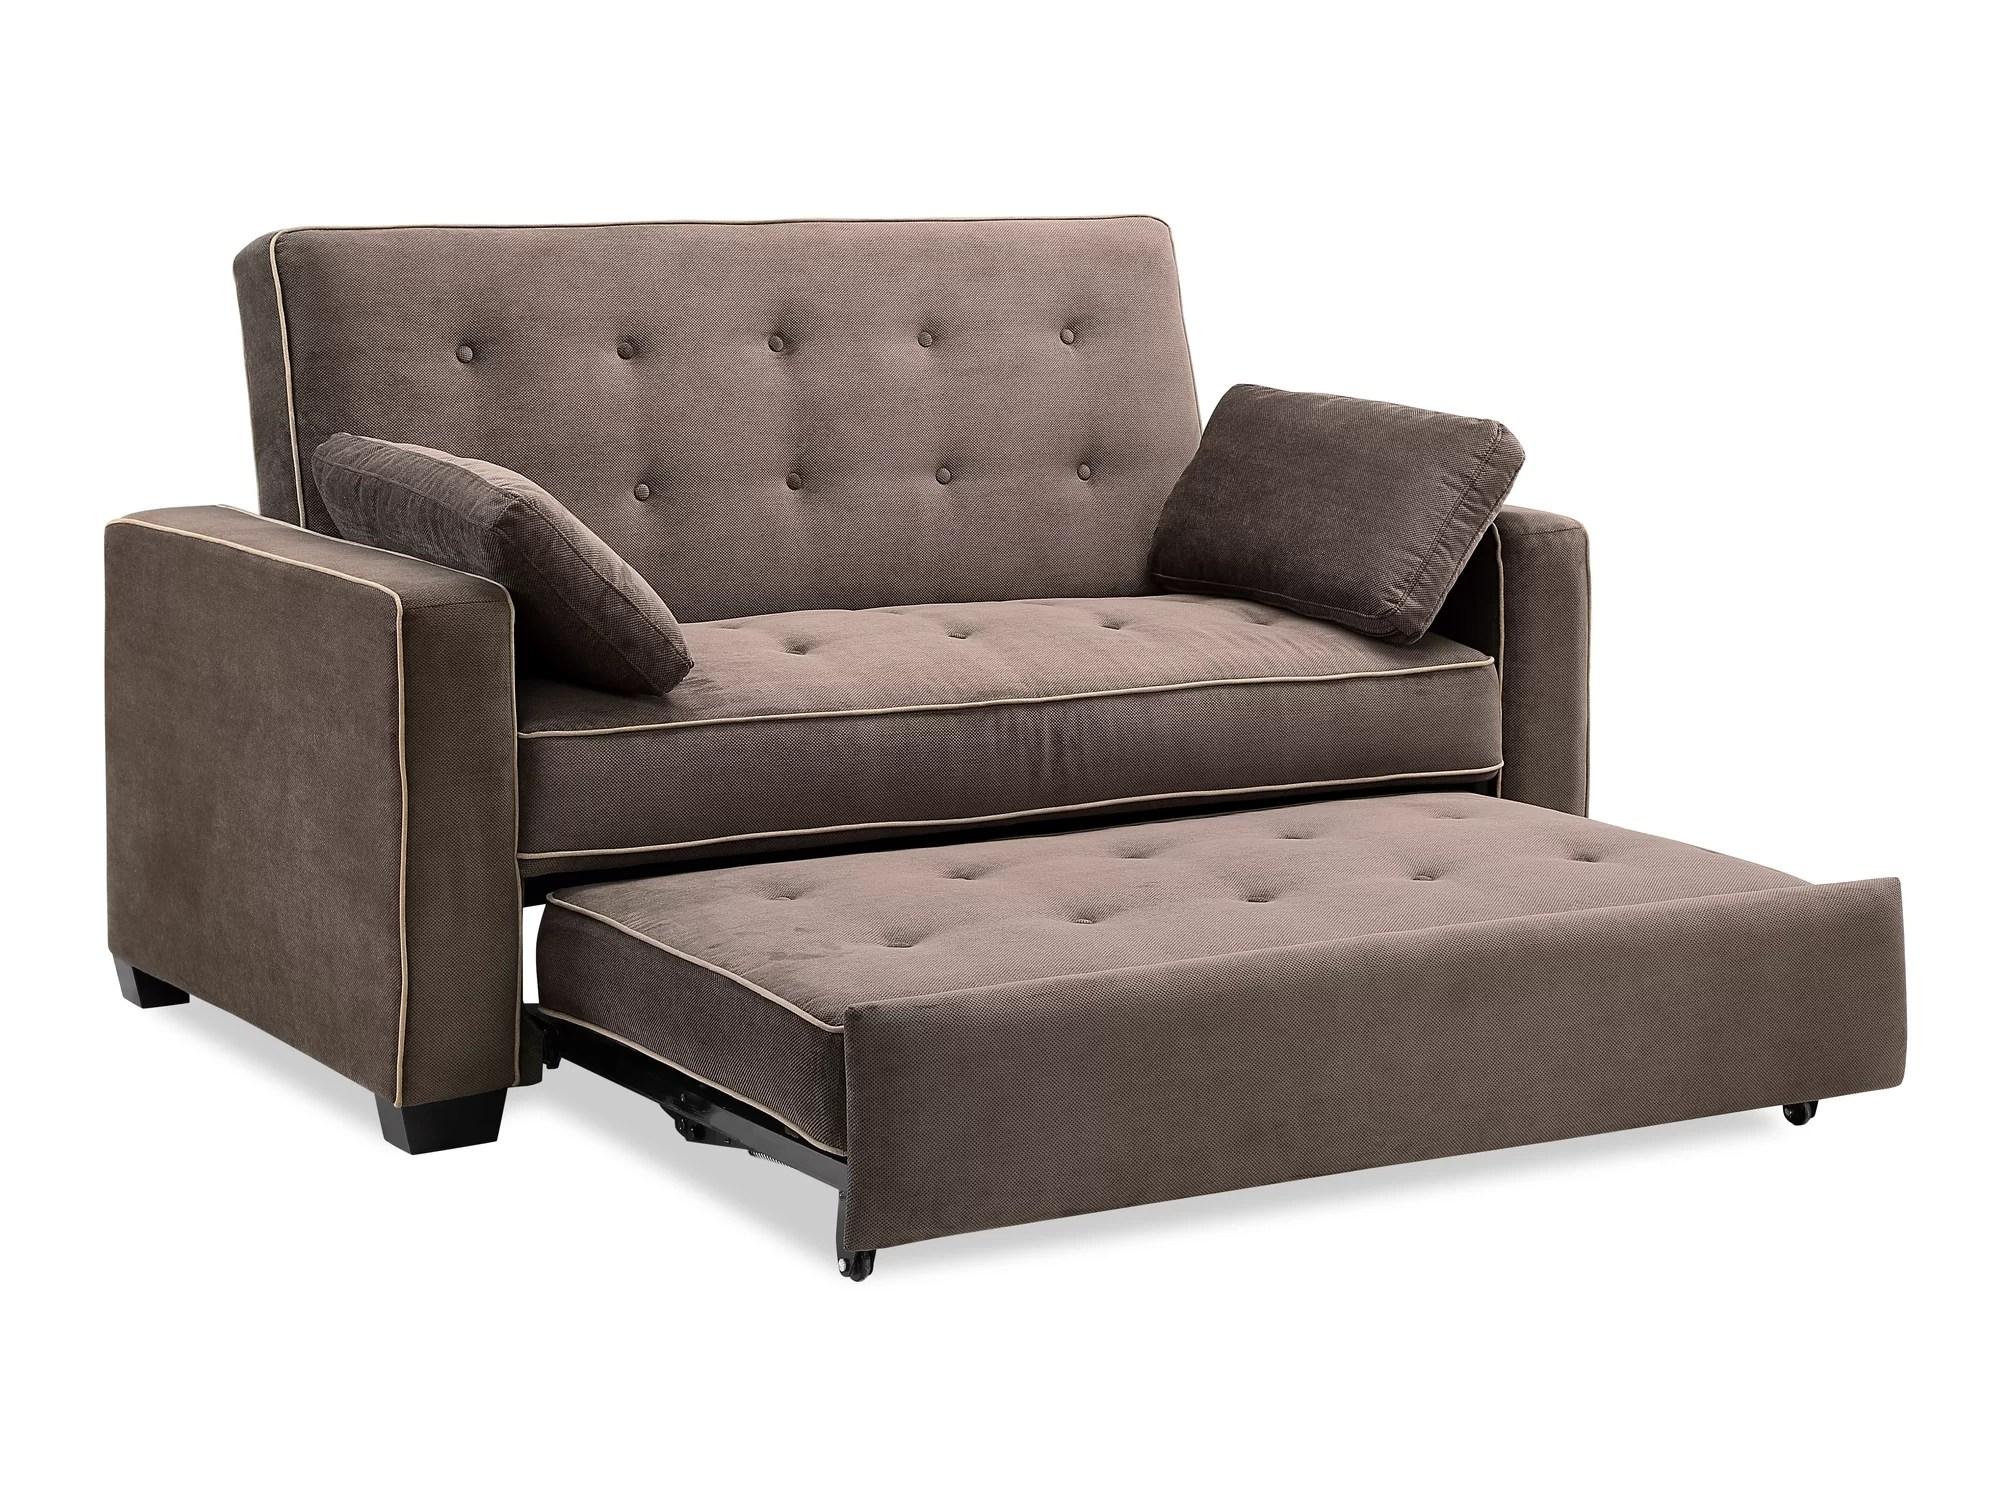 monroe sofa diwan designs lifestyle solutions queen sleeper ebay